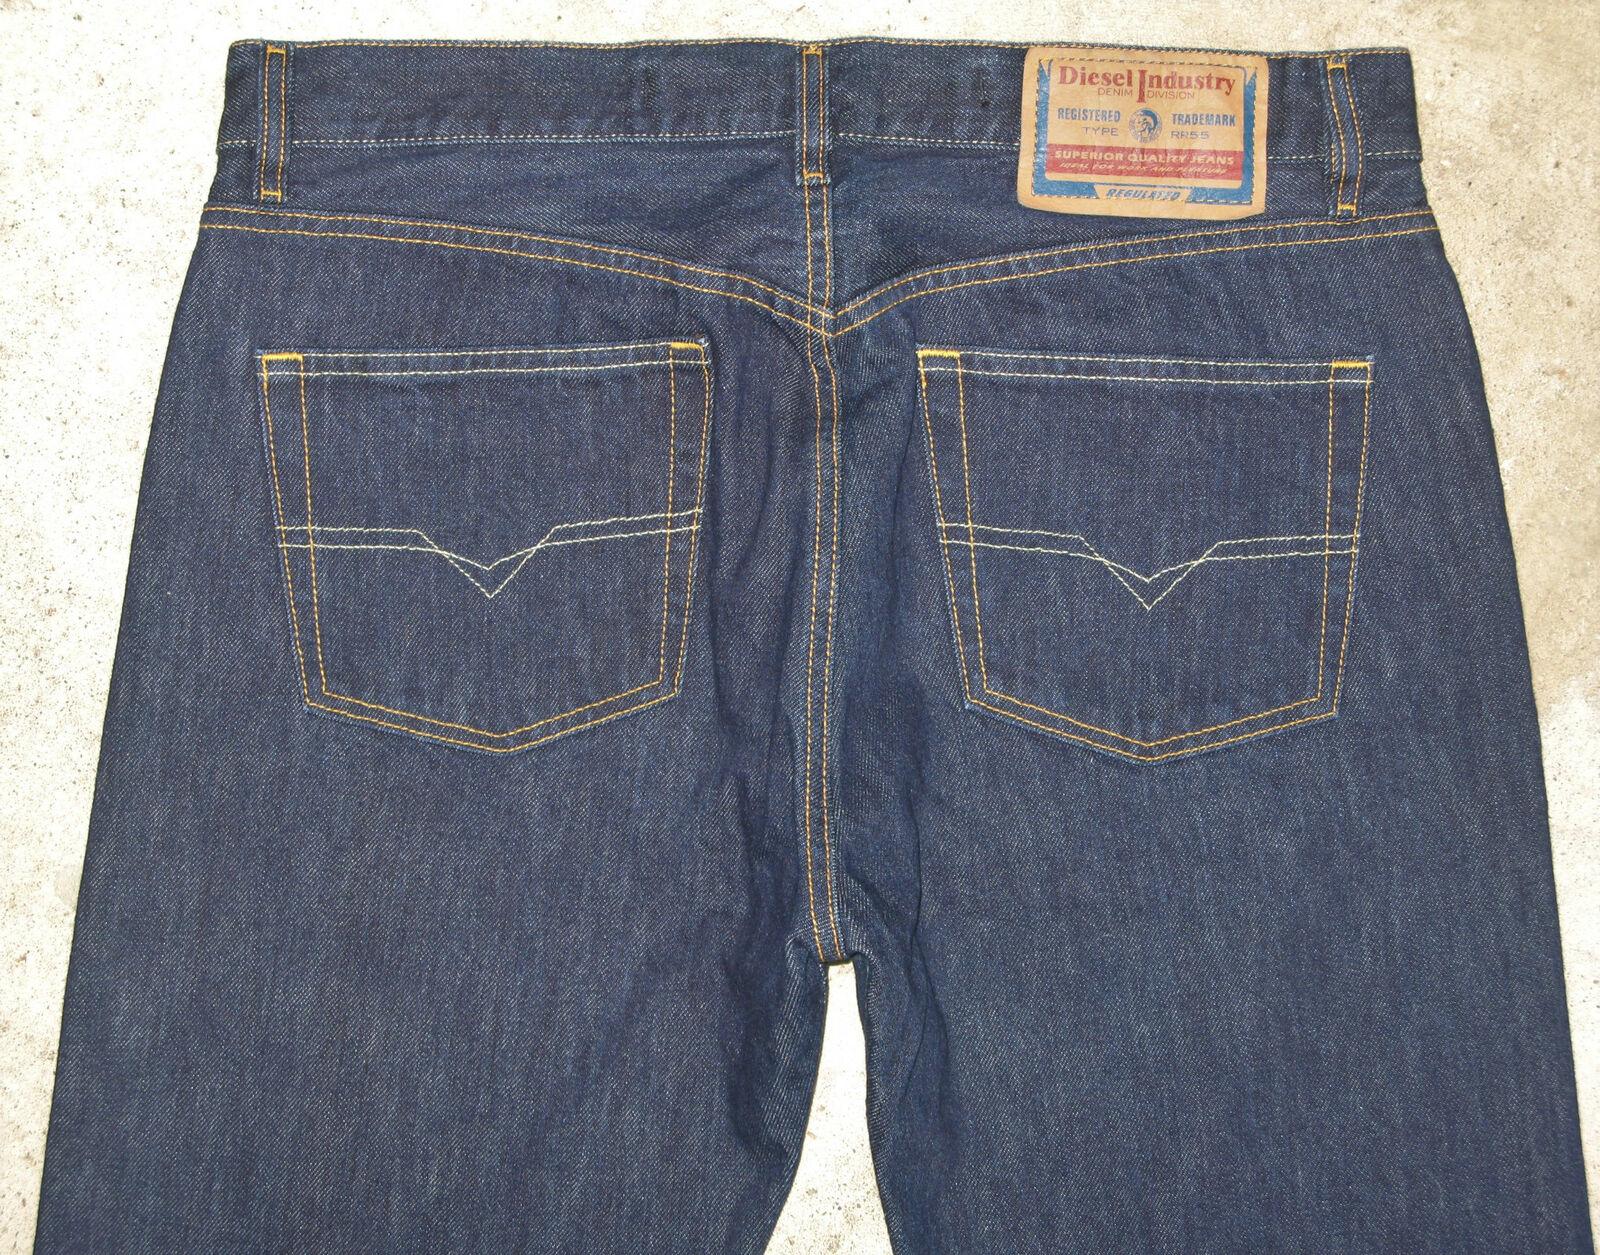 Diesel Keetar Jeans Mens Sz 36 X 33 Tapered Straight Leg 100% Cotton  Made